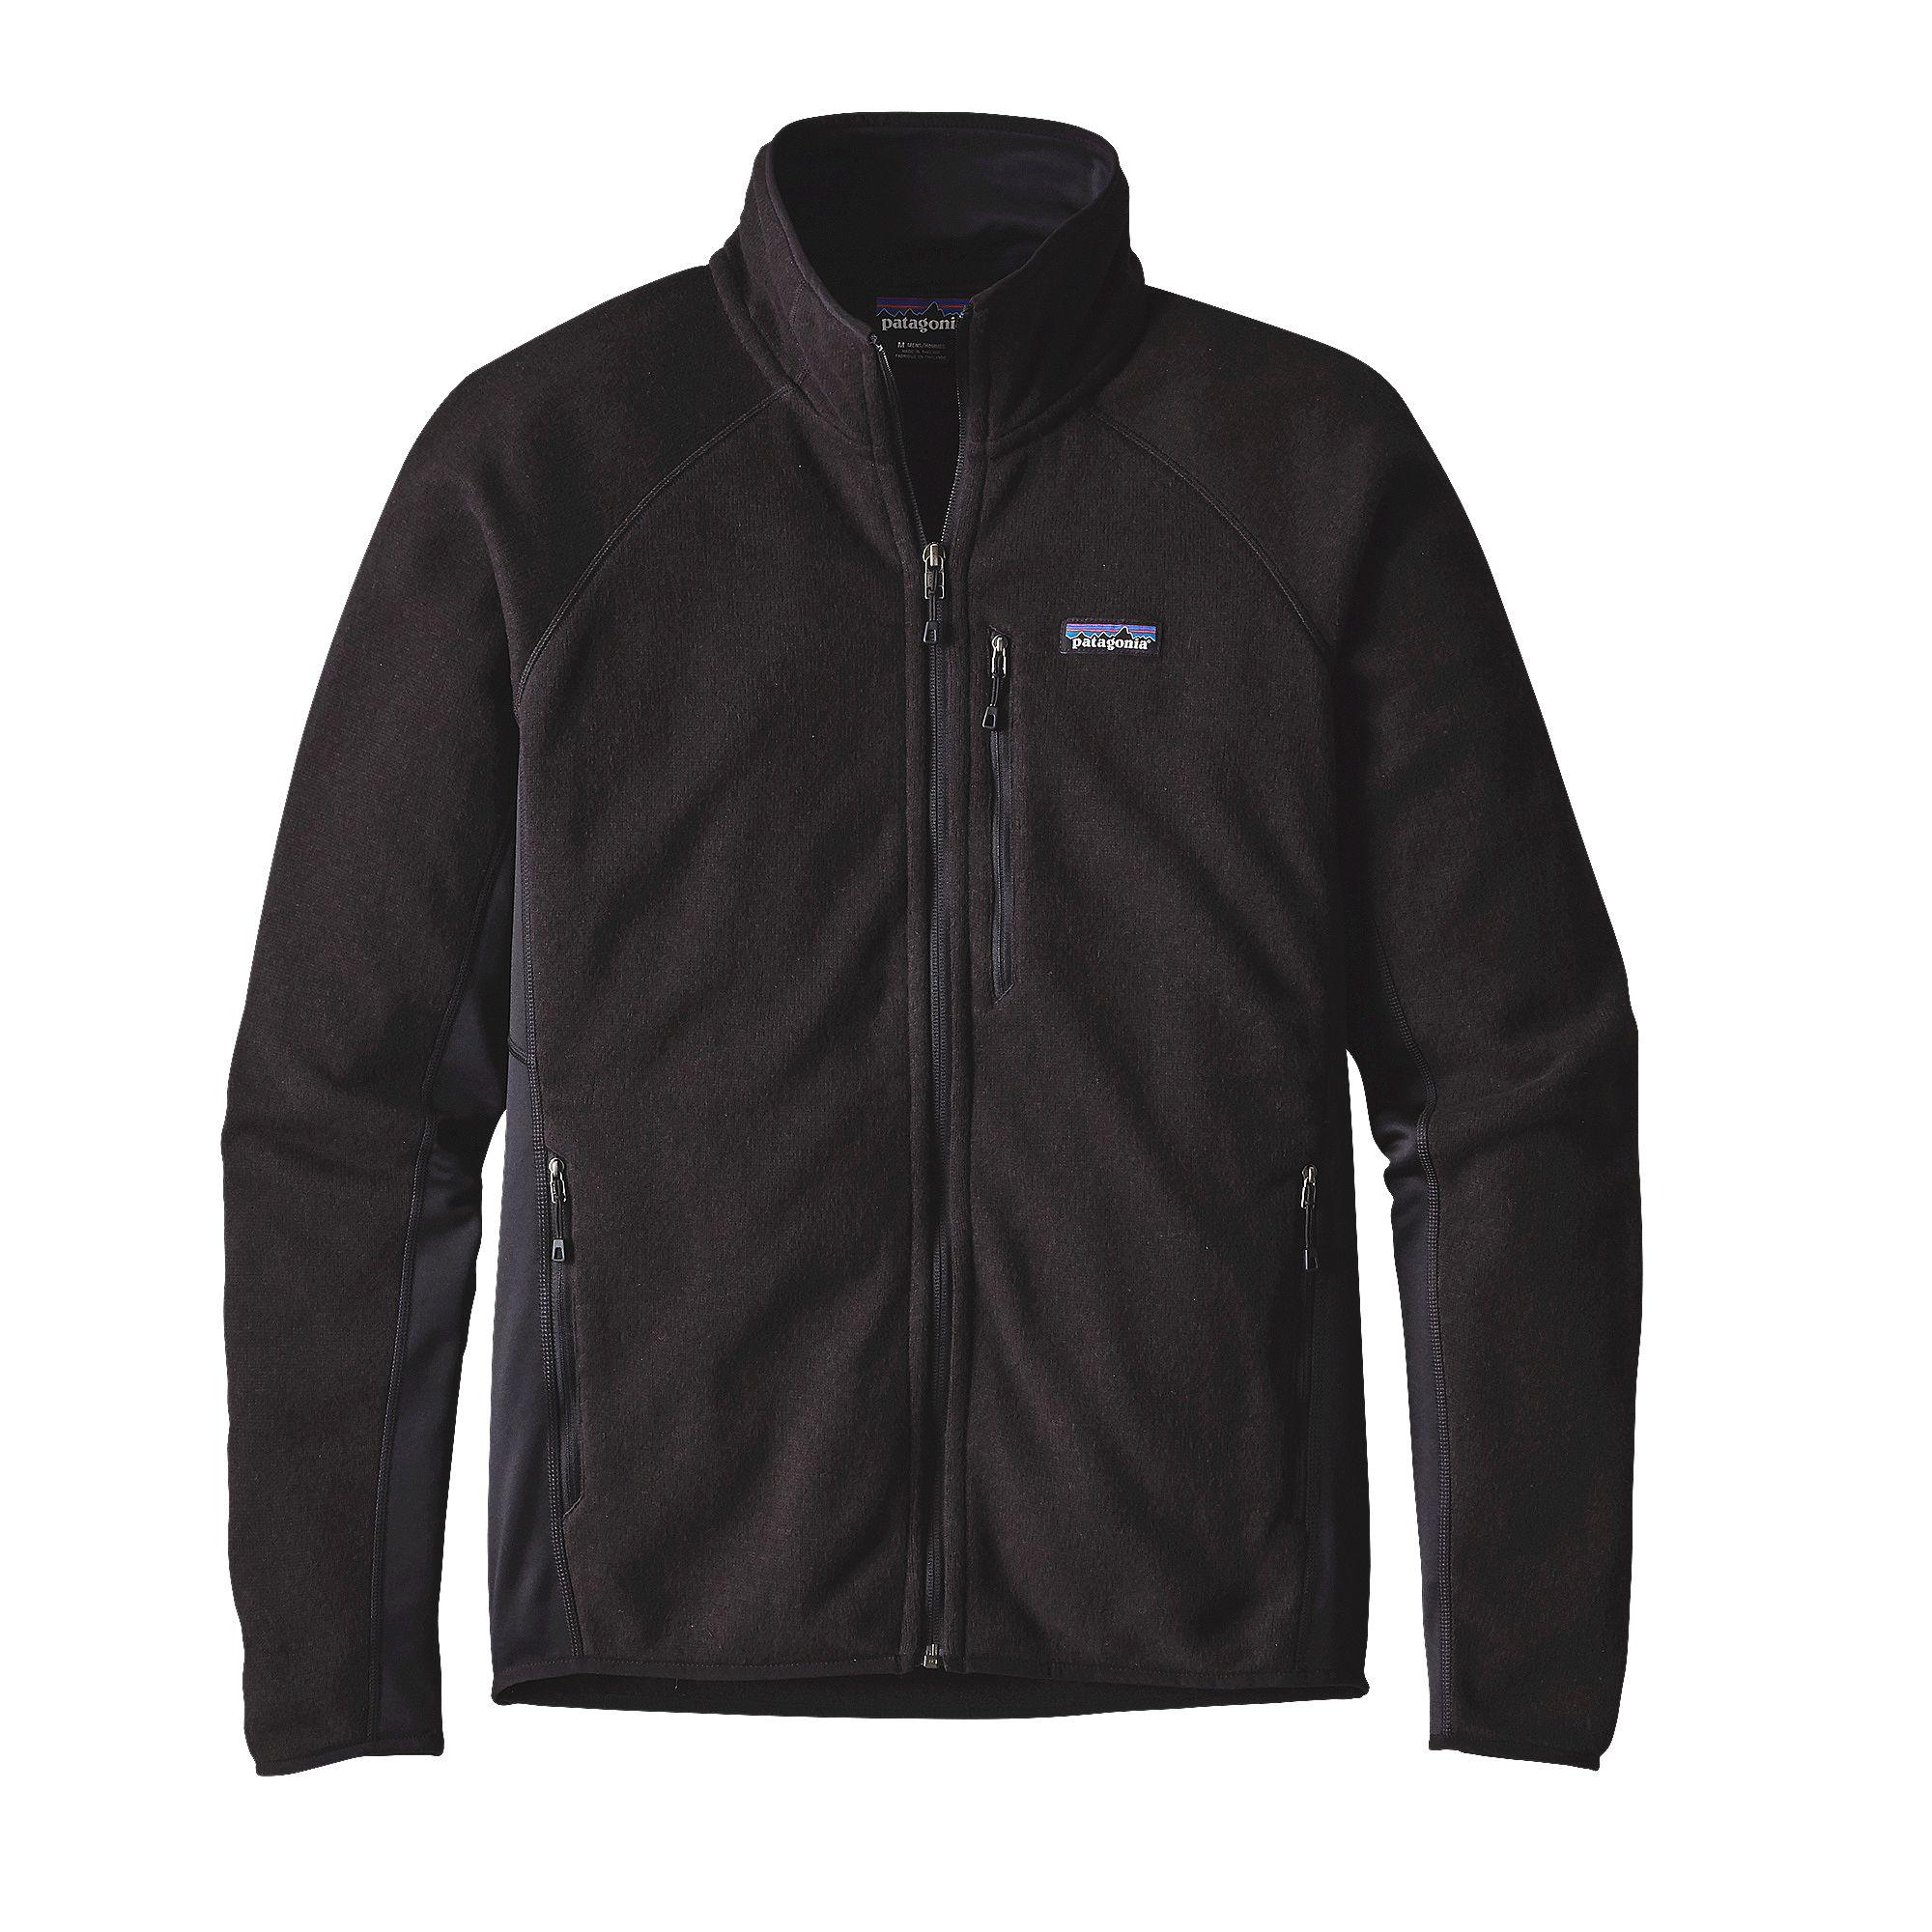 Men's Performance Better Sweater® Fleece Jacket